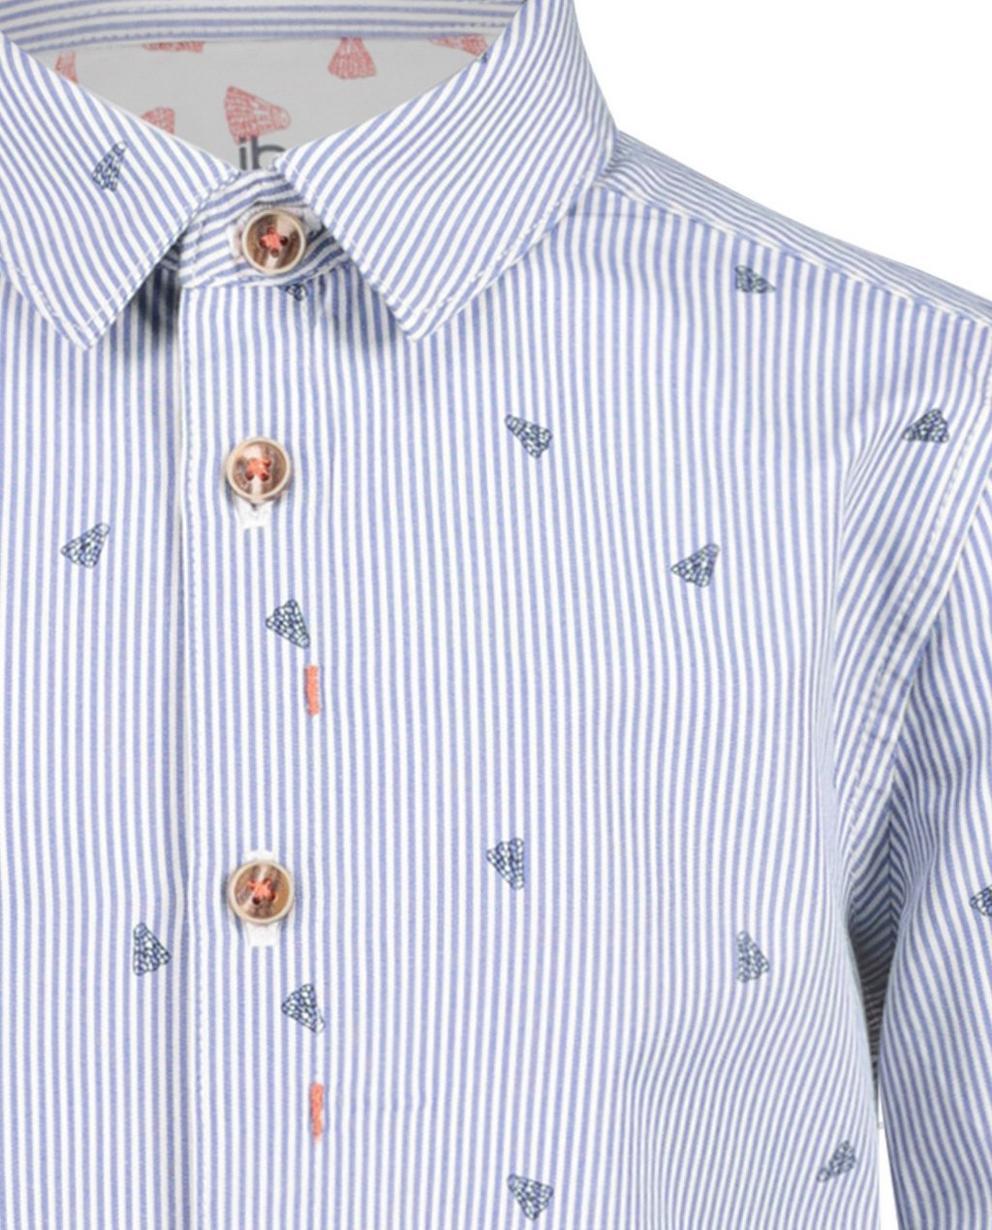 Hemden - Gestreept hemd